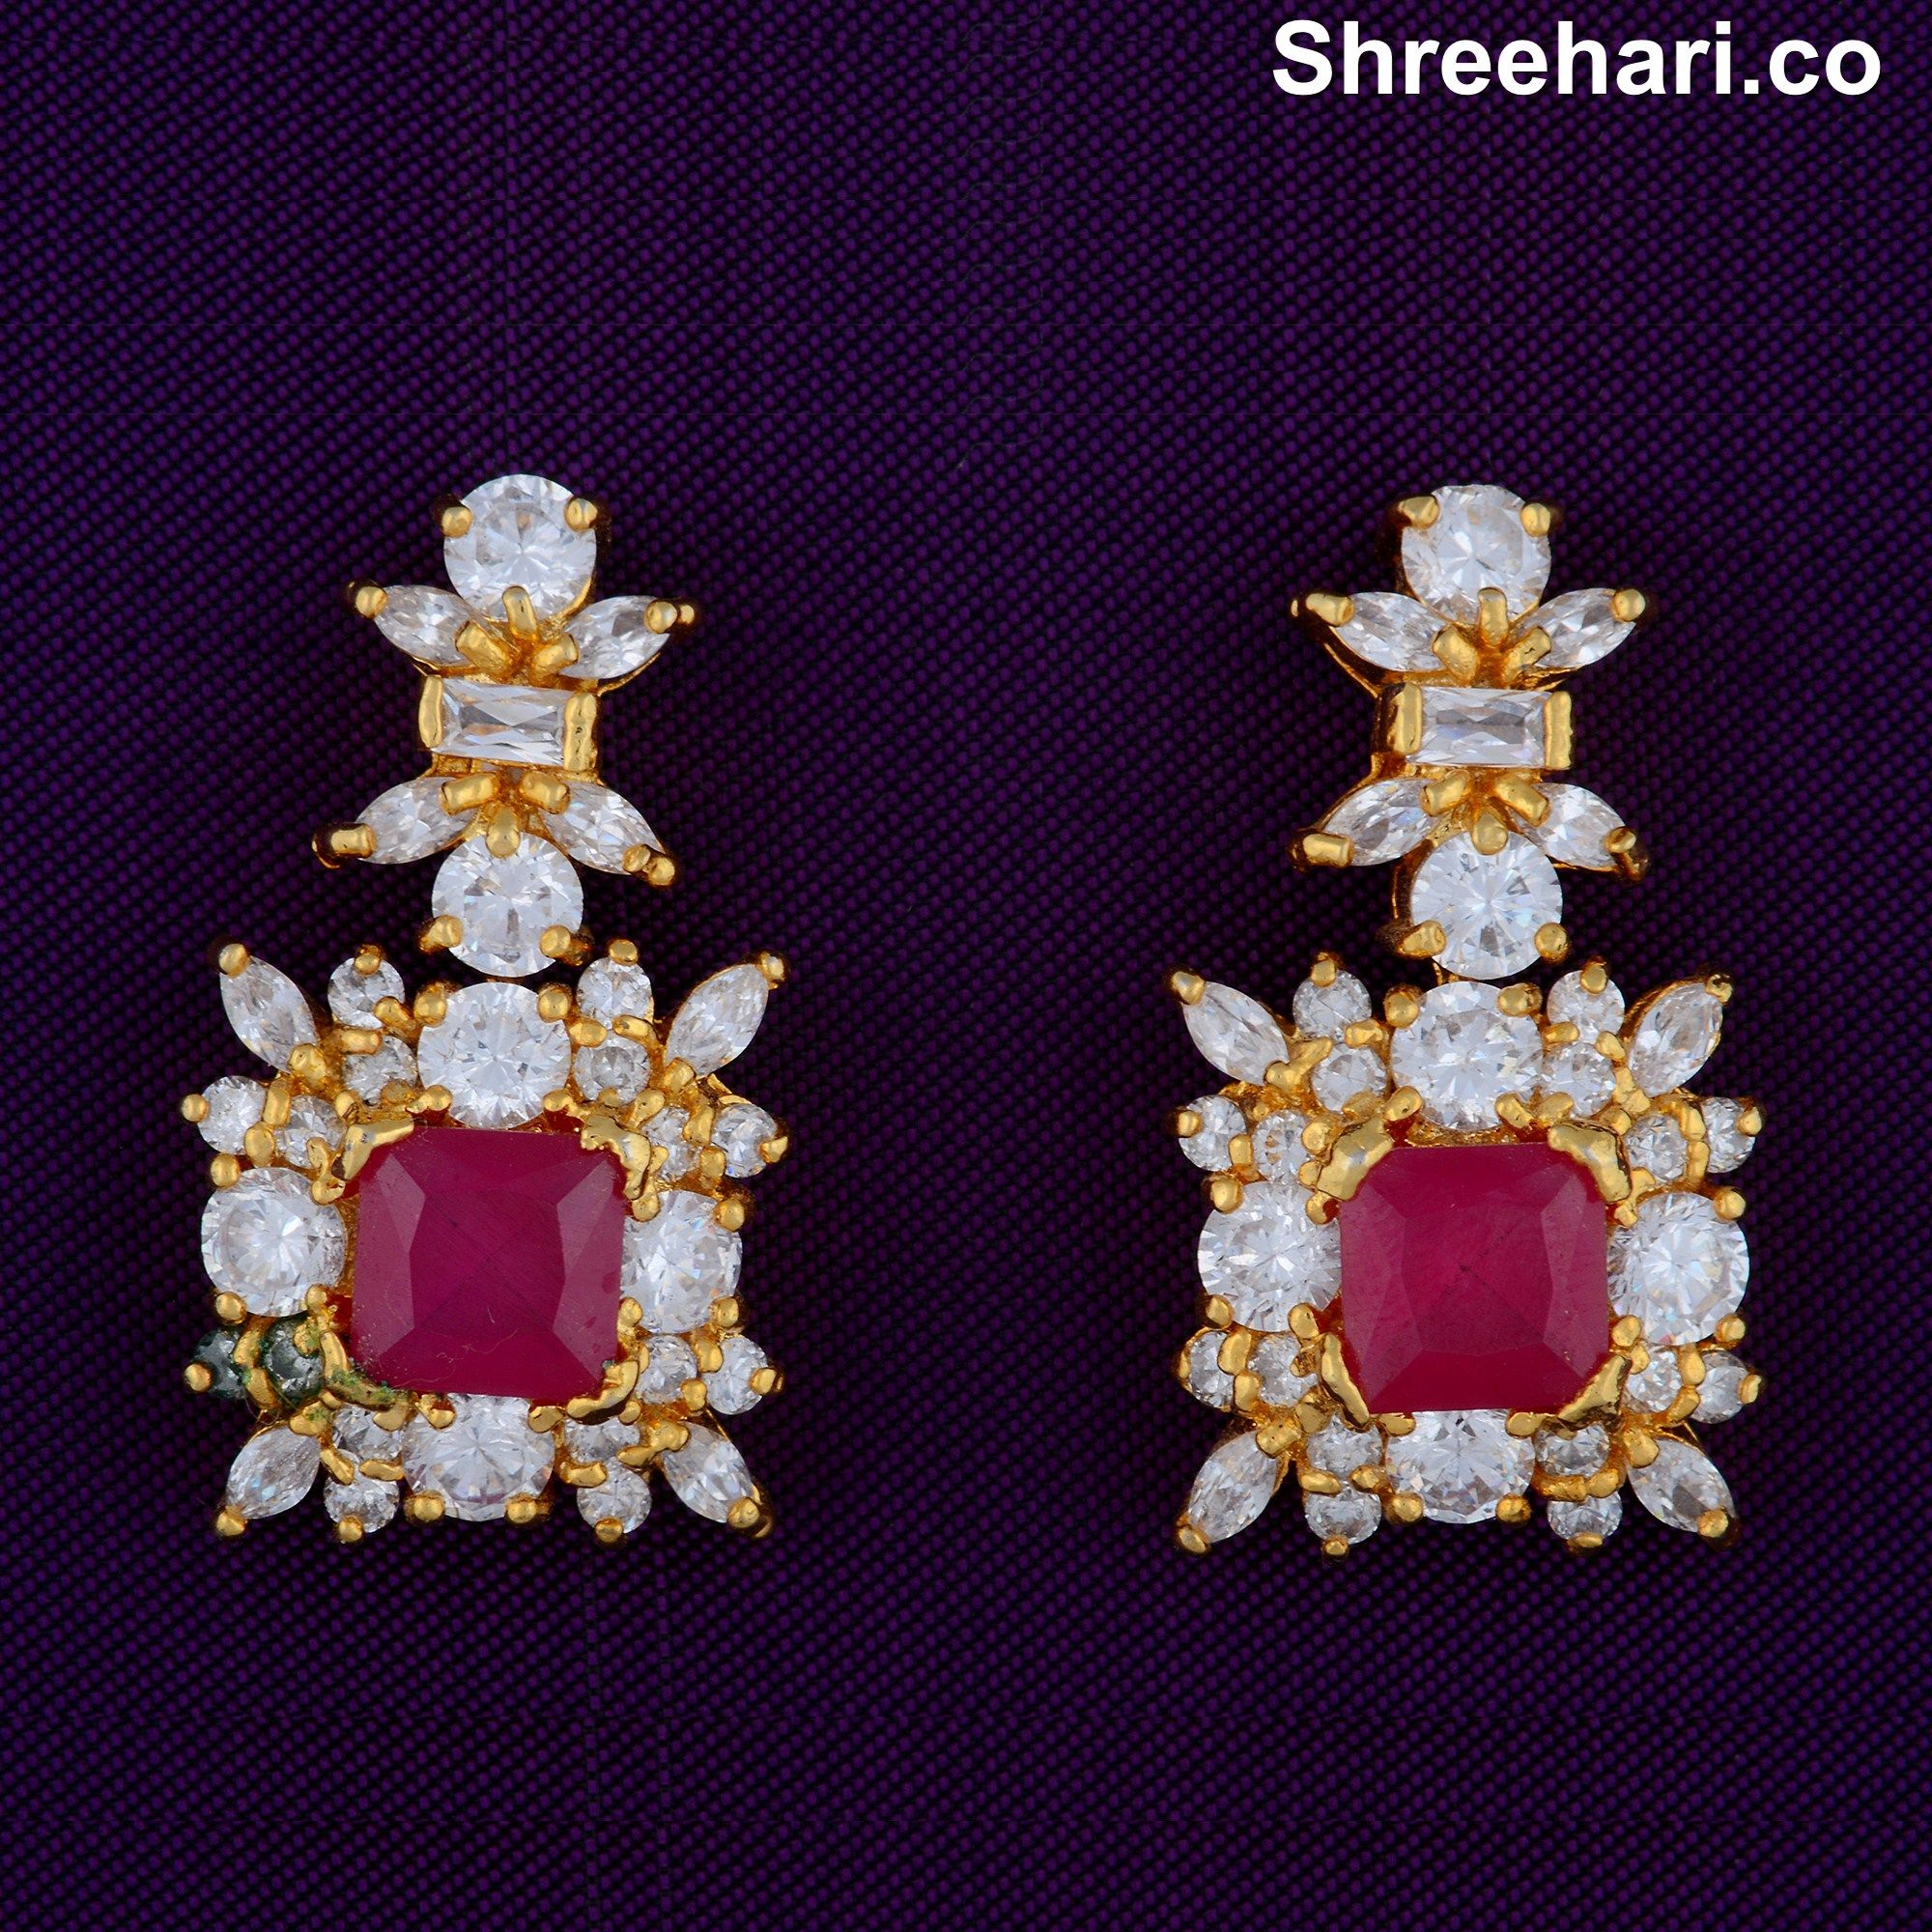 http://www.shreehari.co/ jewellery for INR 680.00 http://bit.ly/1LzXqrN